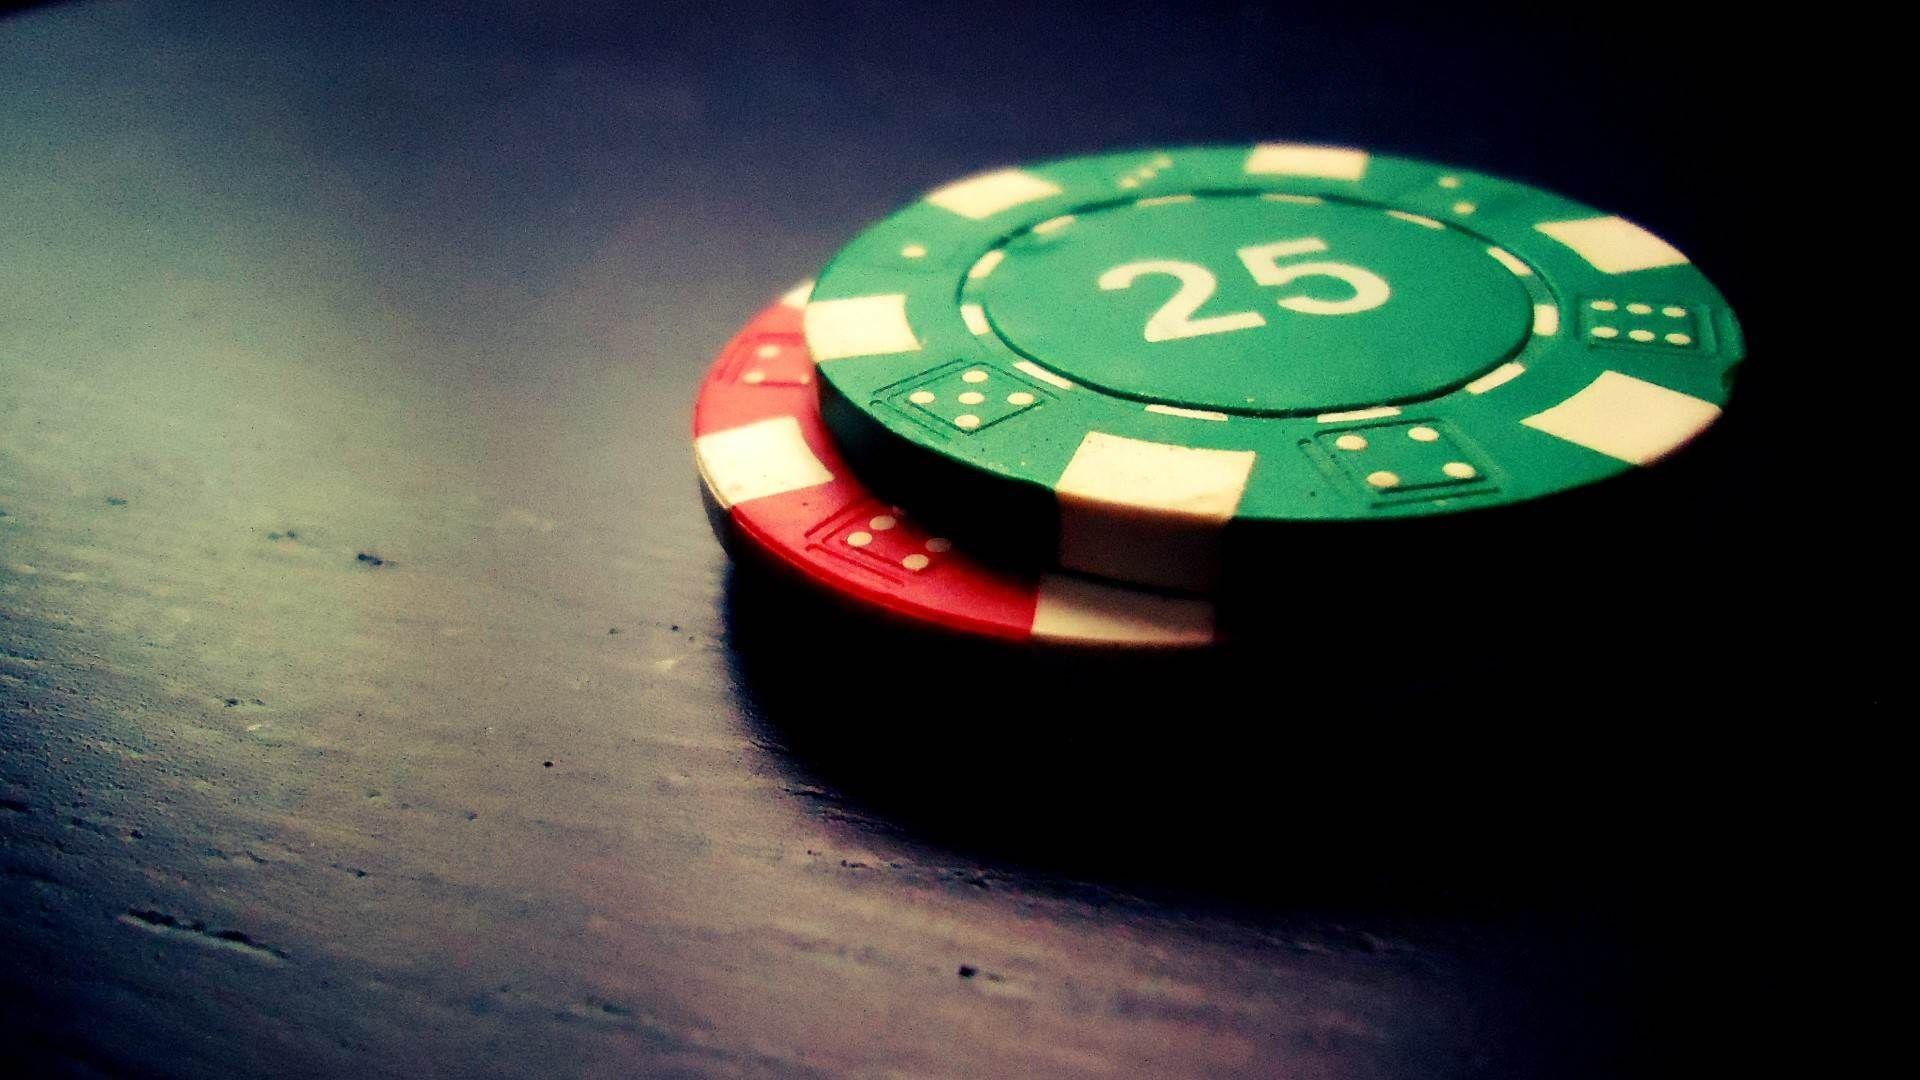 Casino Experiment Good or Dangerous